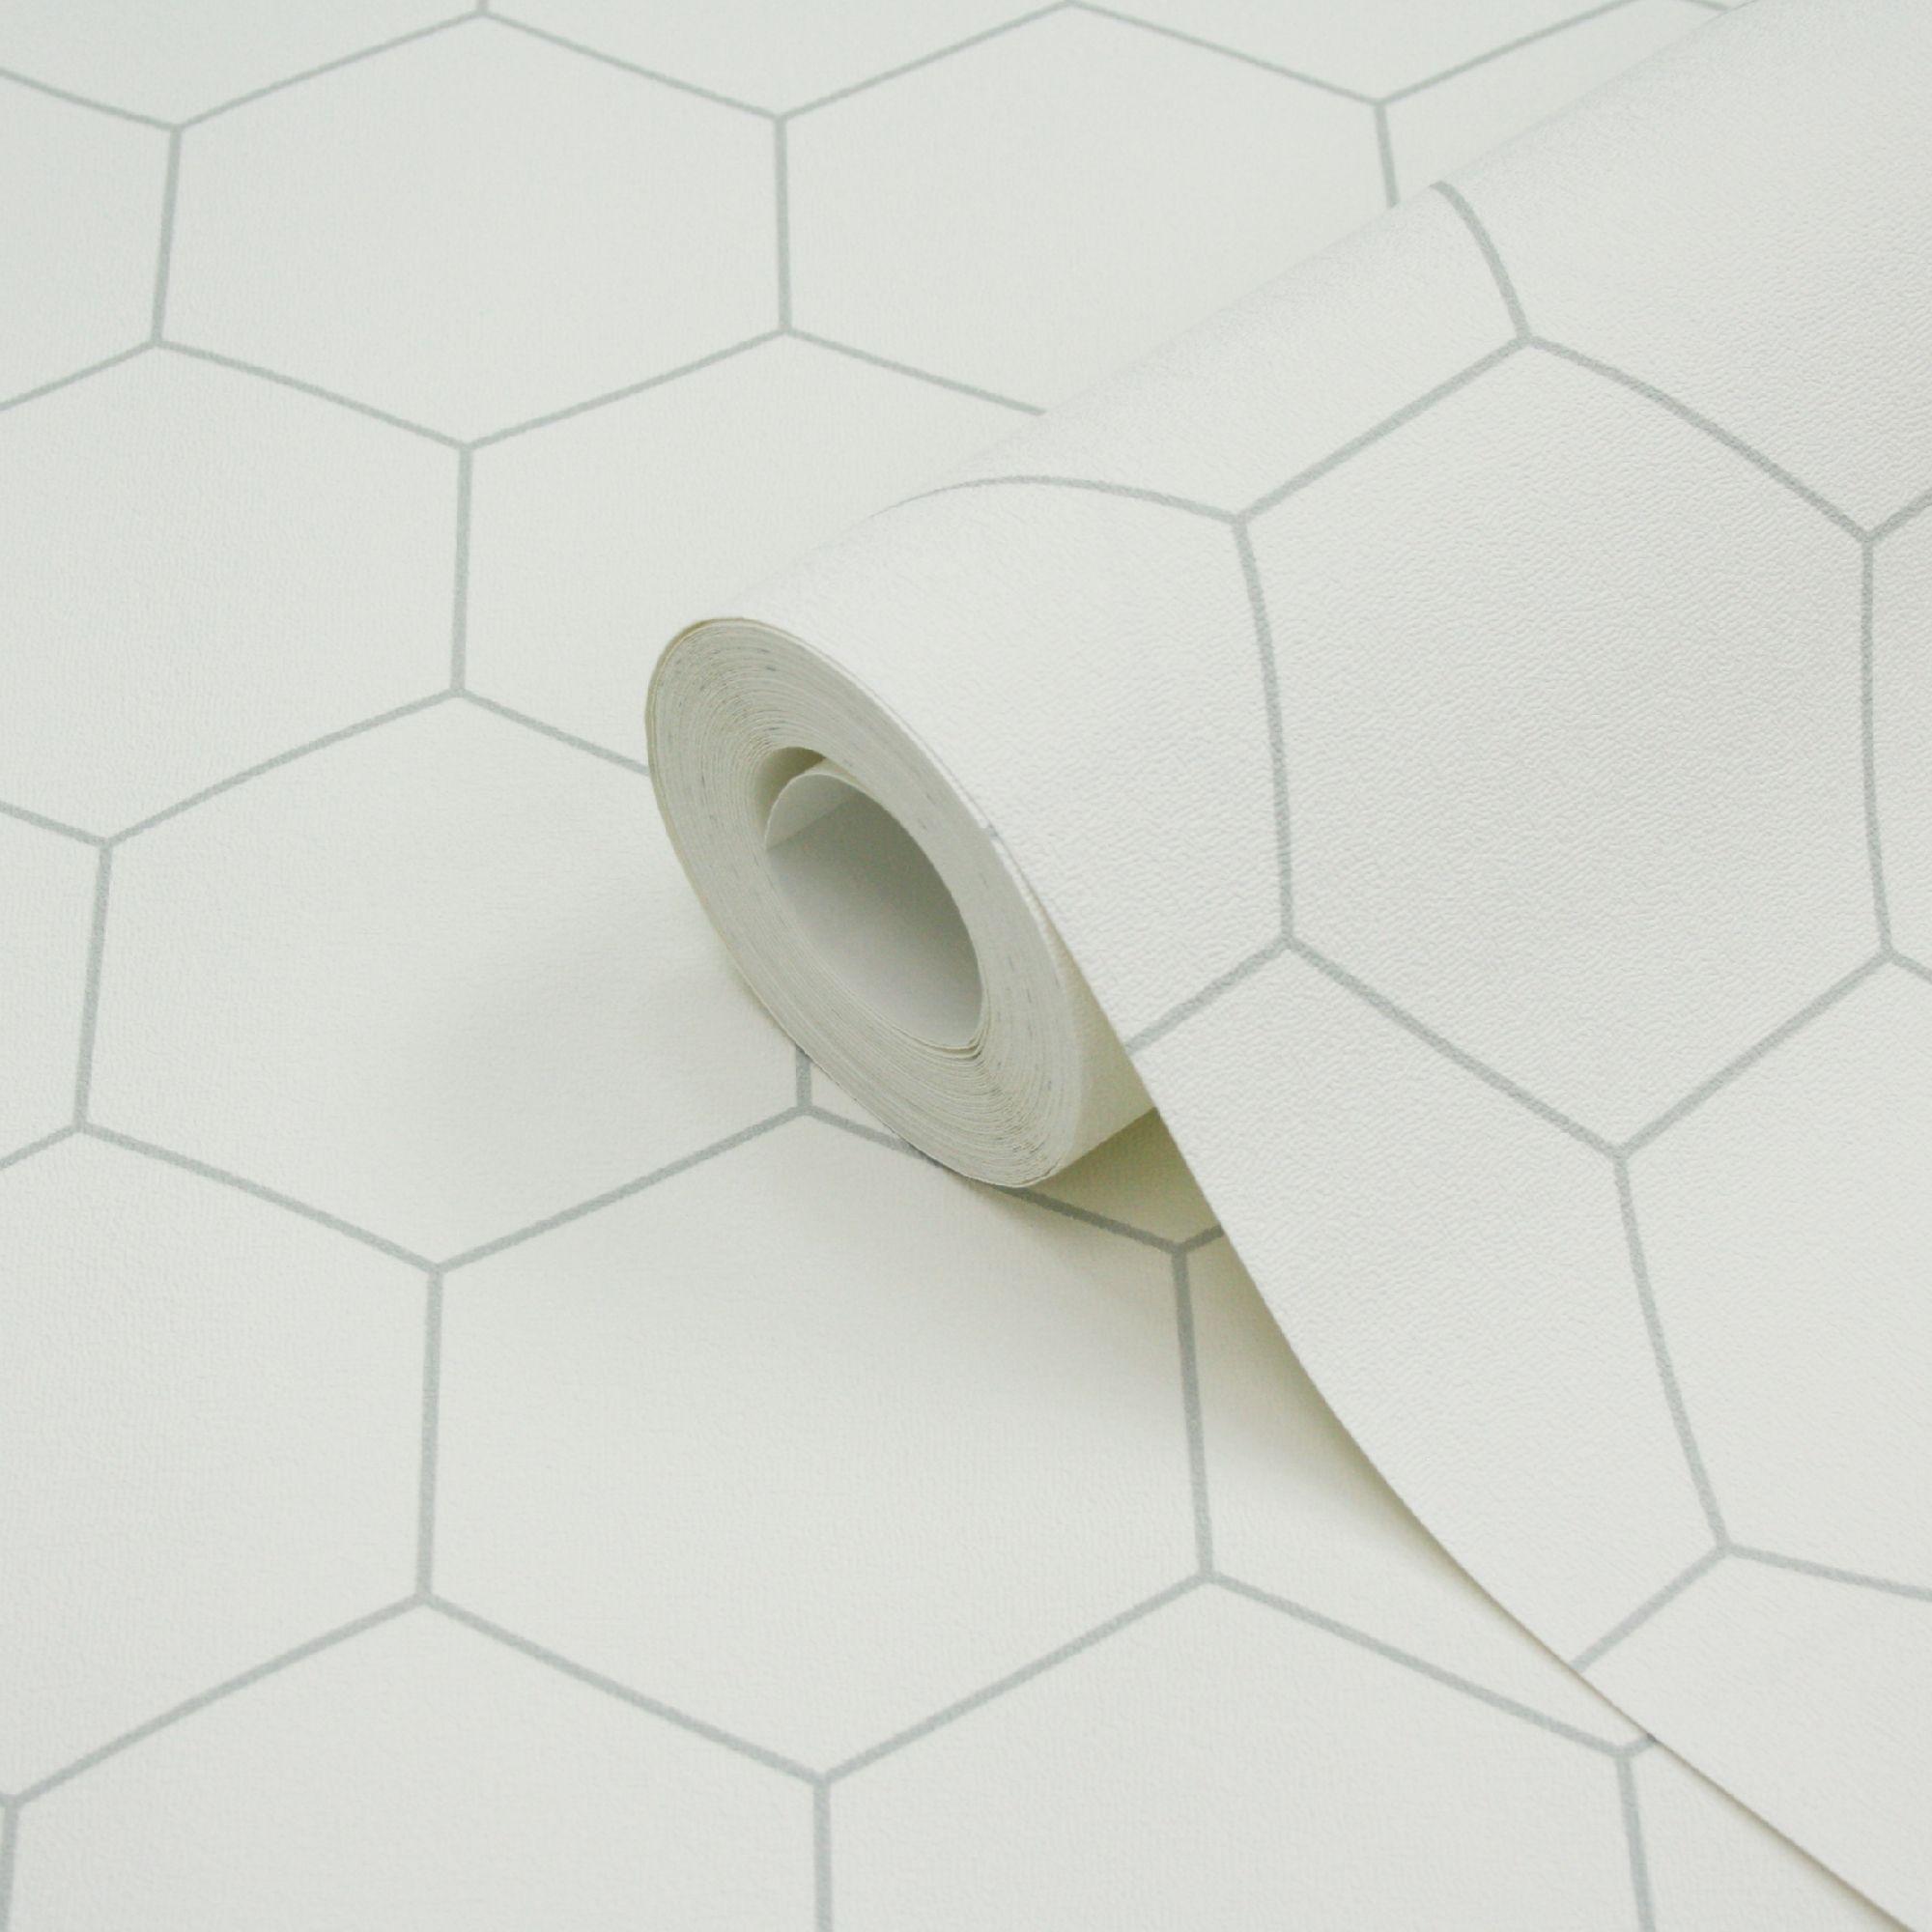 Sce Lutece Geometric White & Grey Hexagons Wallpaper | Wallpaper ...